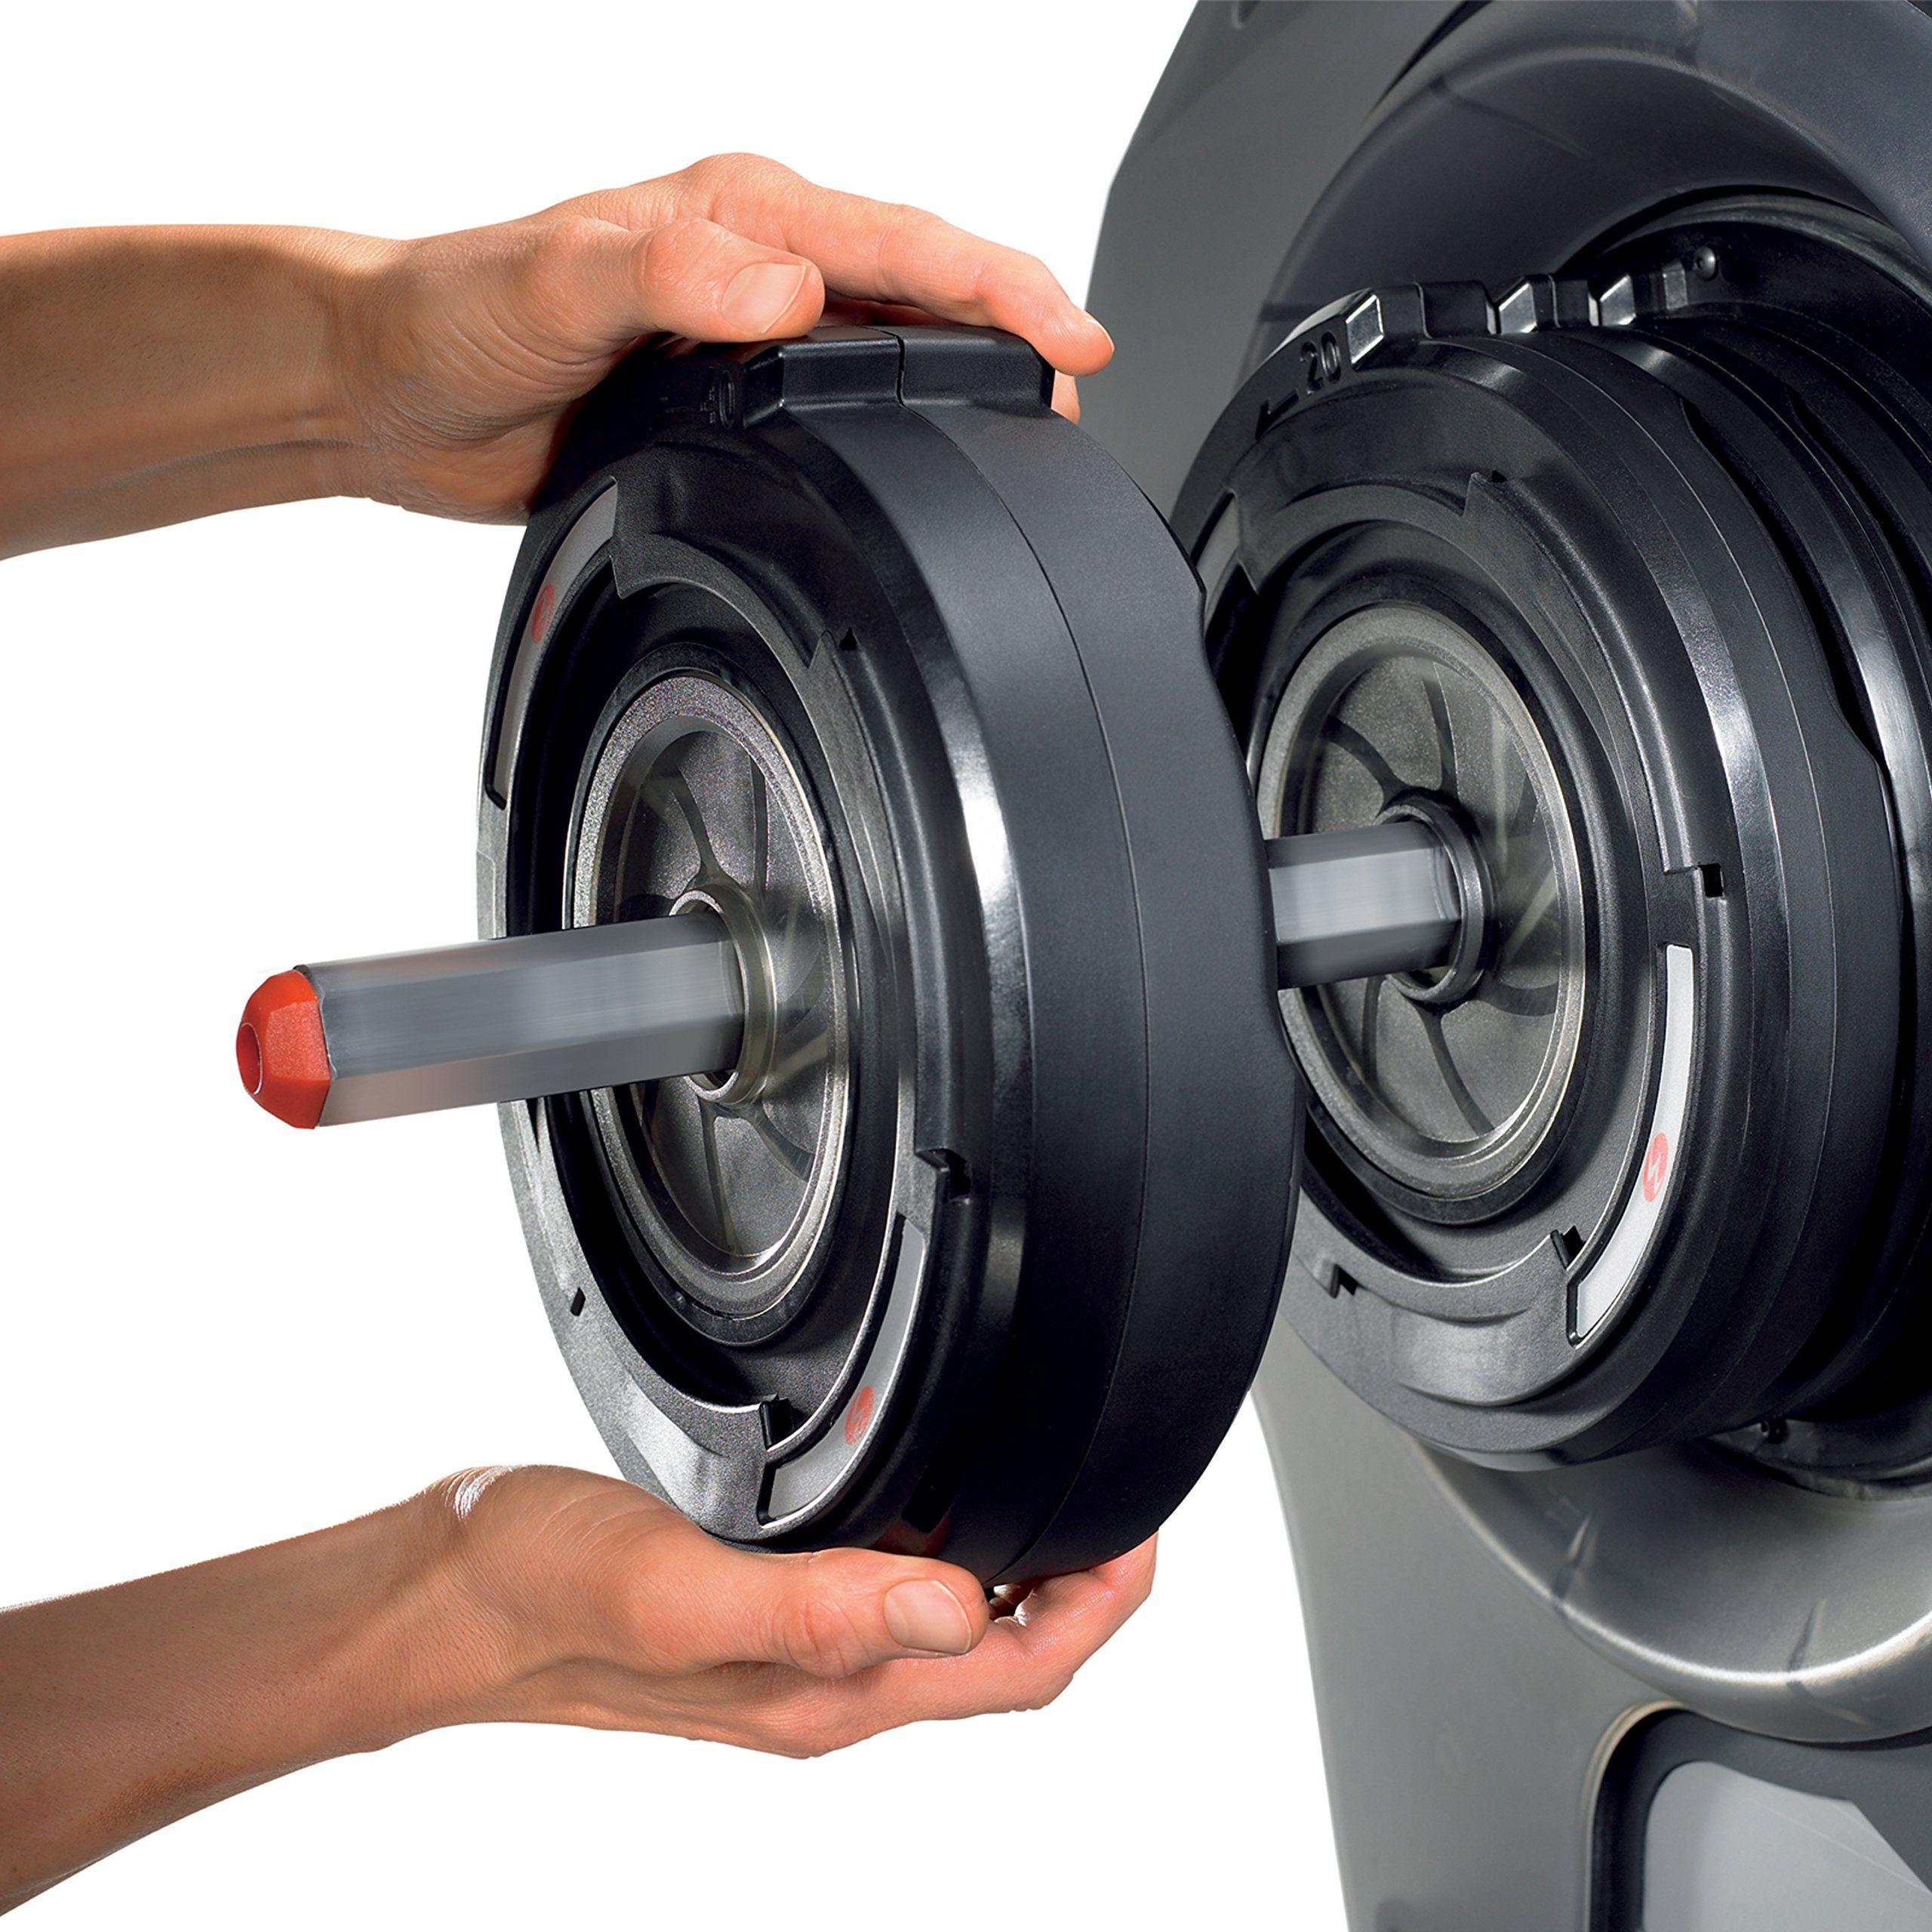 Bowflex revolution 80 lb spiraflex upgrade look into